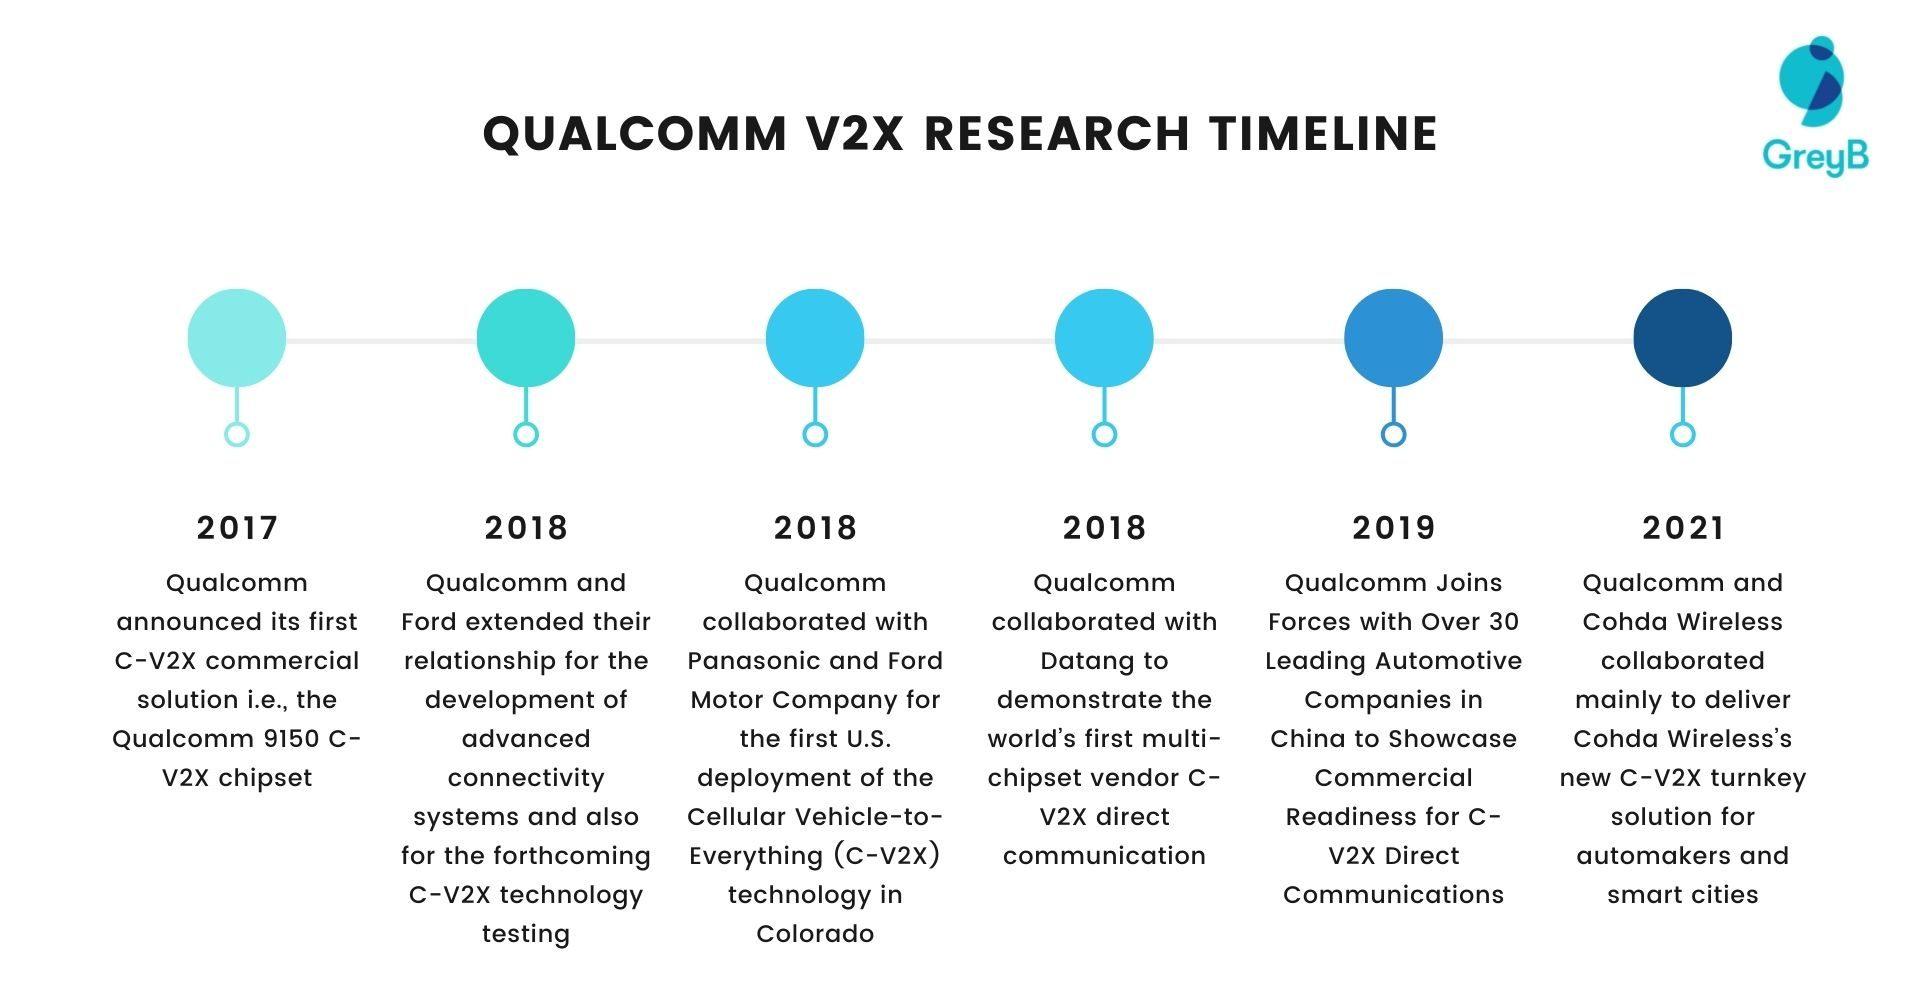 Qualcomm V2X Research Timeline